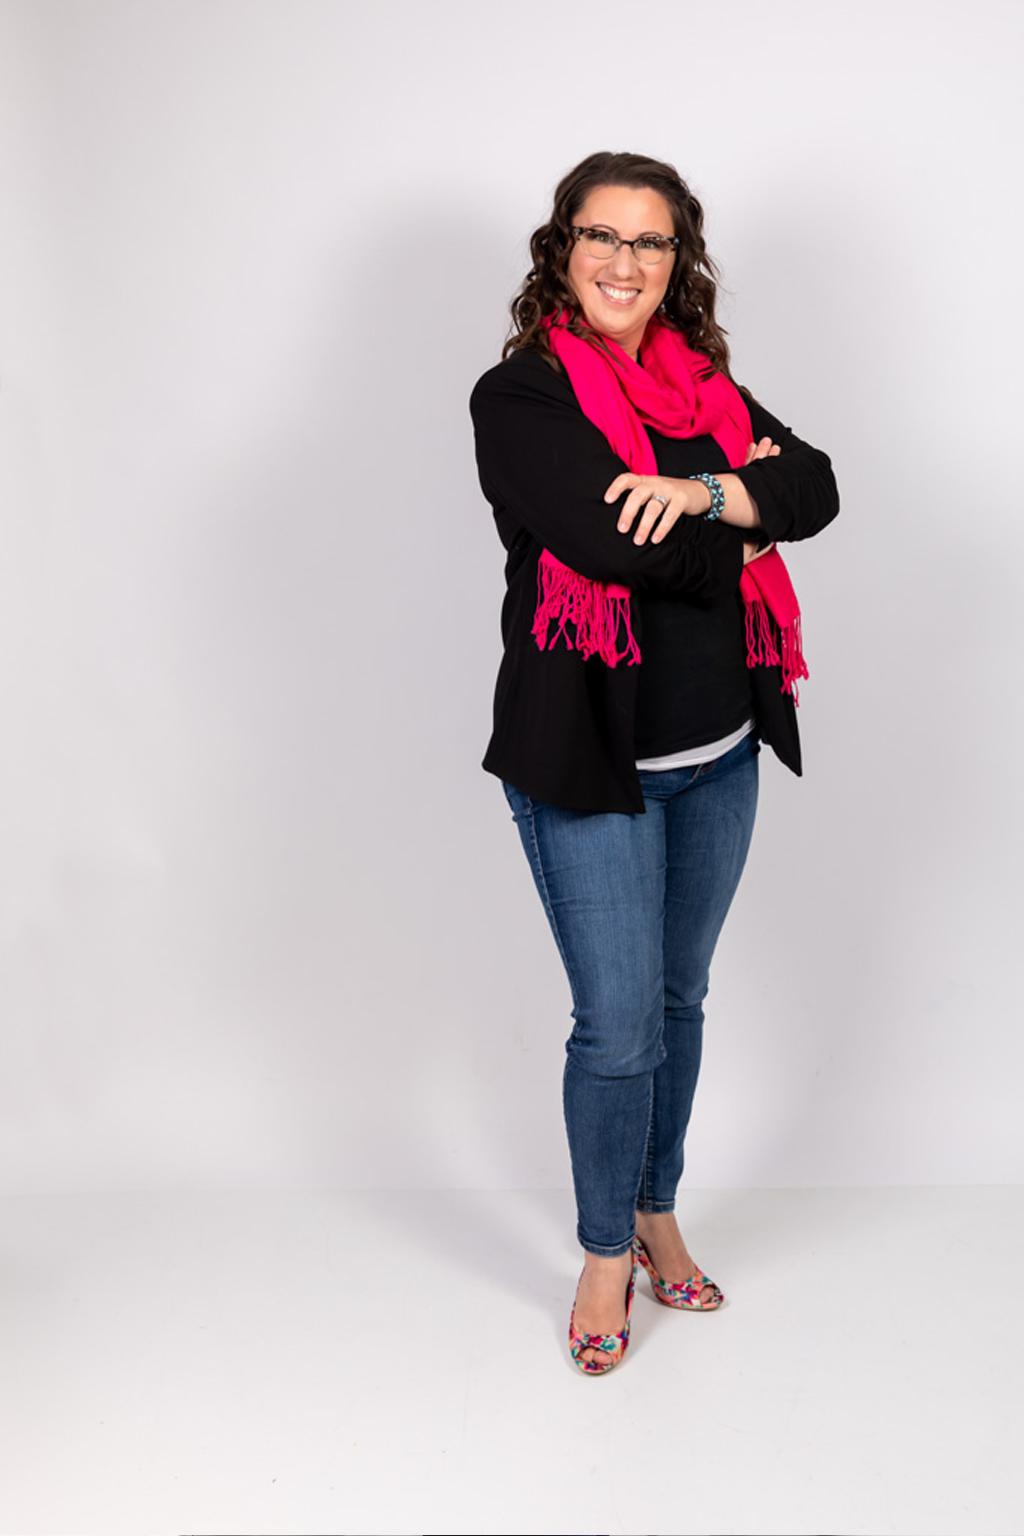 Dionne Thomson Life Coaching Life Coach